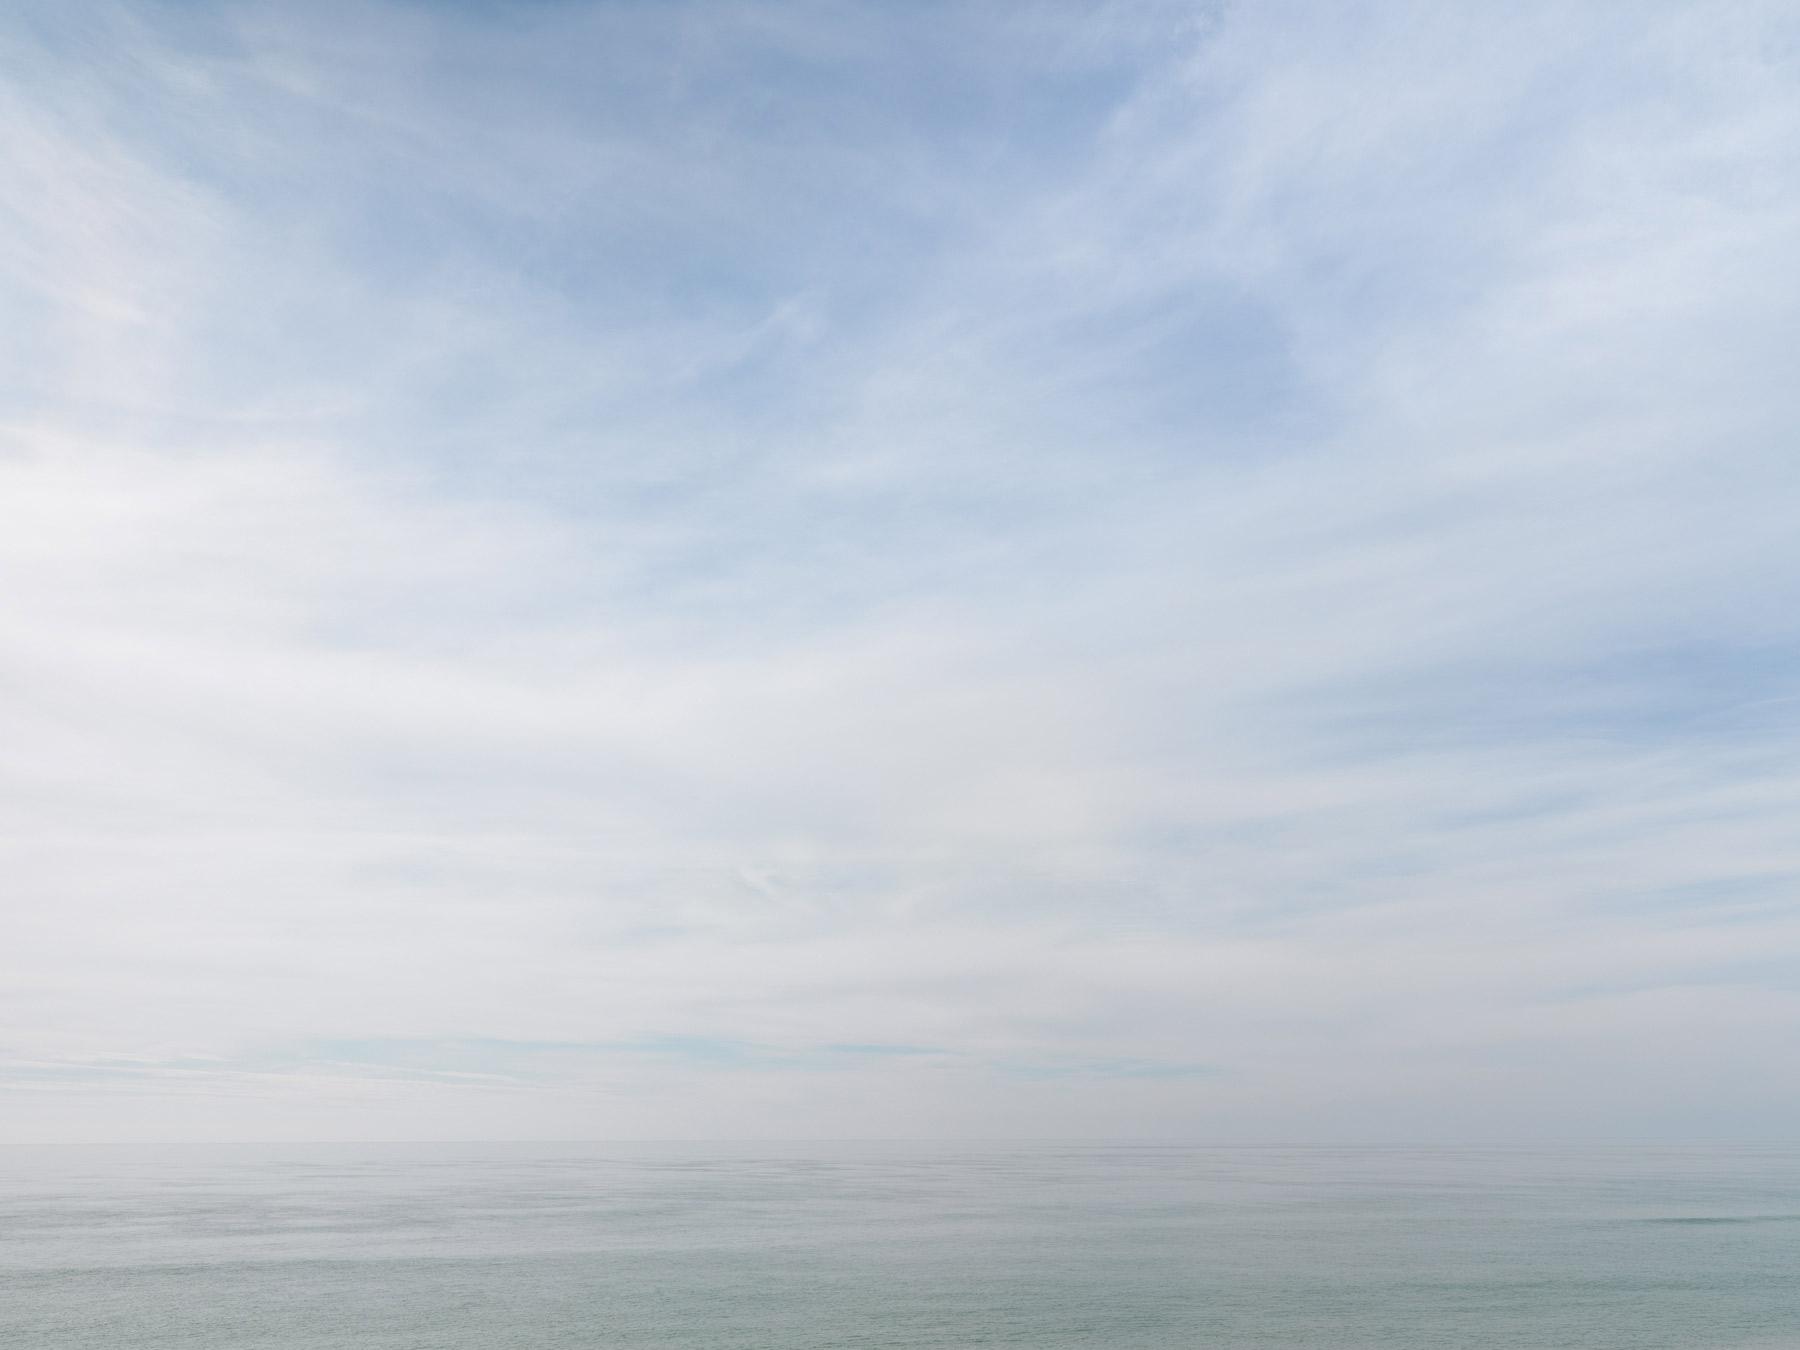 Calm-Horizon-A5229-Web.jpg